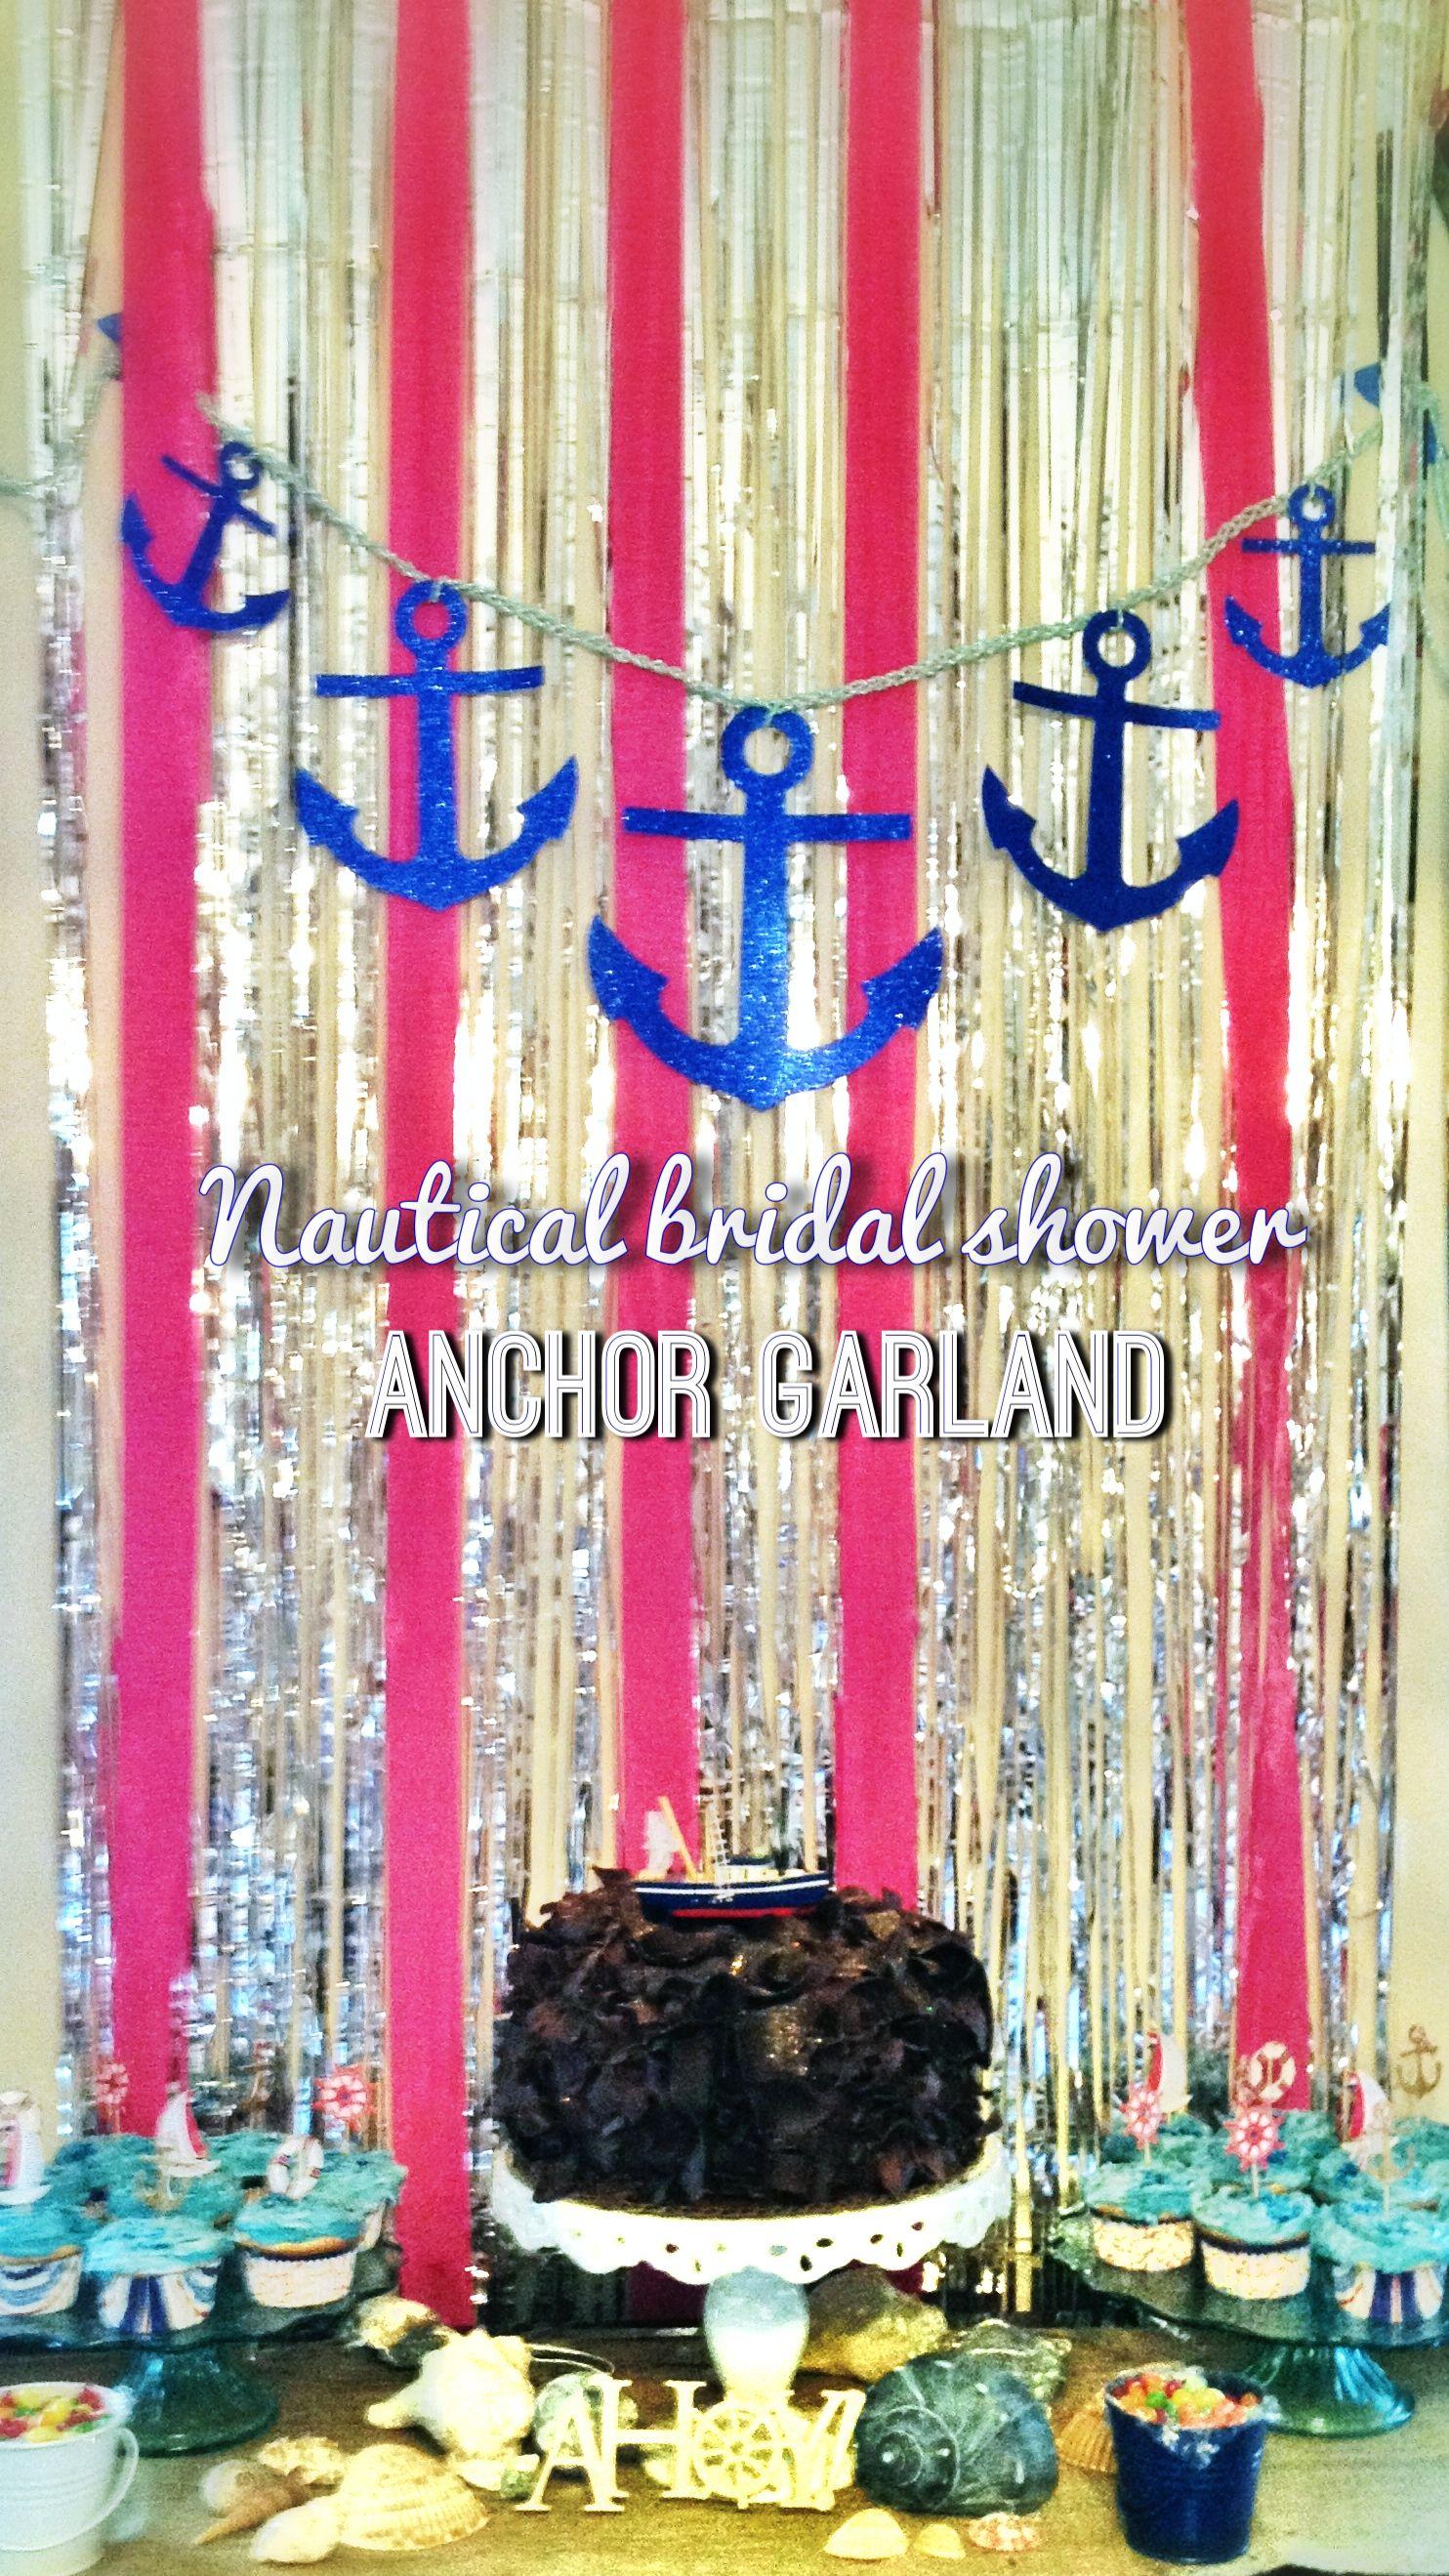 Nautical anchor garland for bridal shower dessert table #diy | My ...